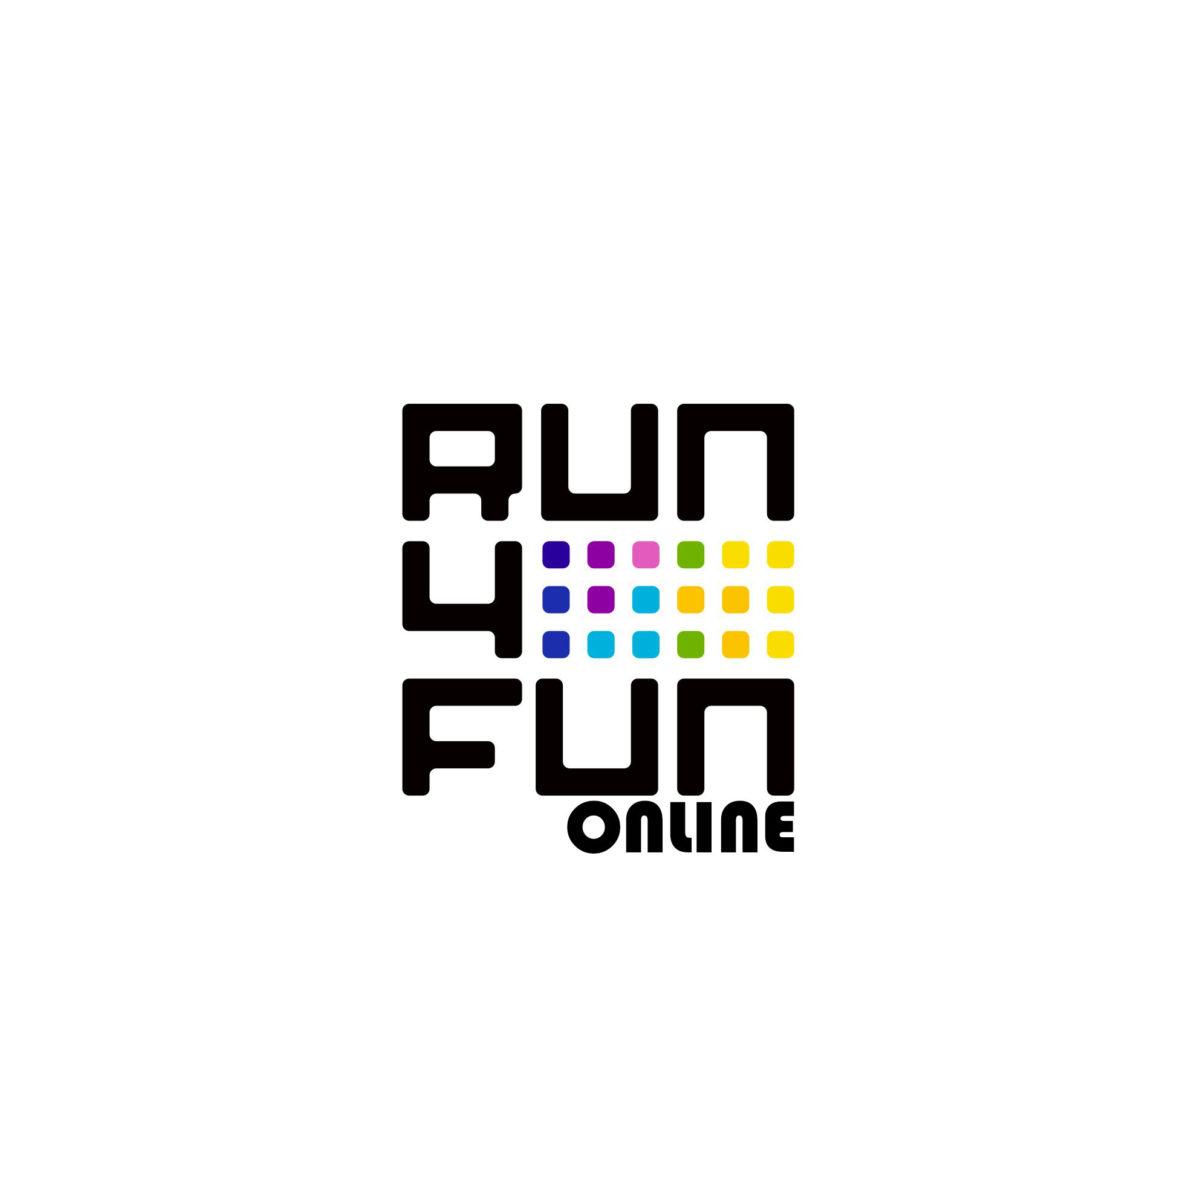 r4f_online_logo